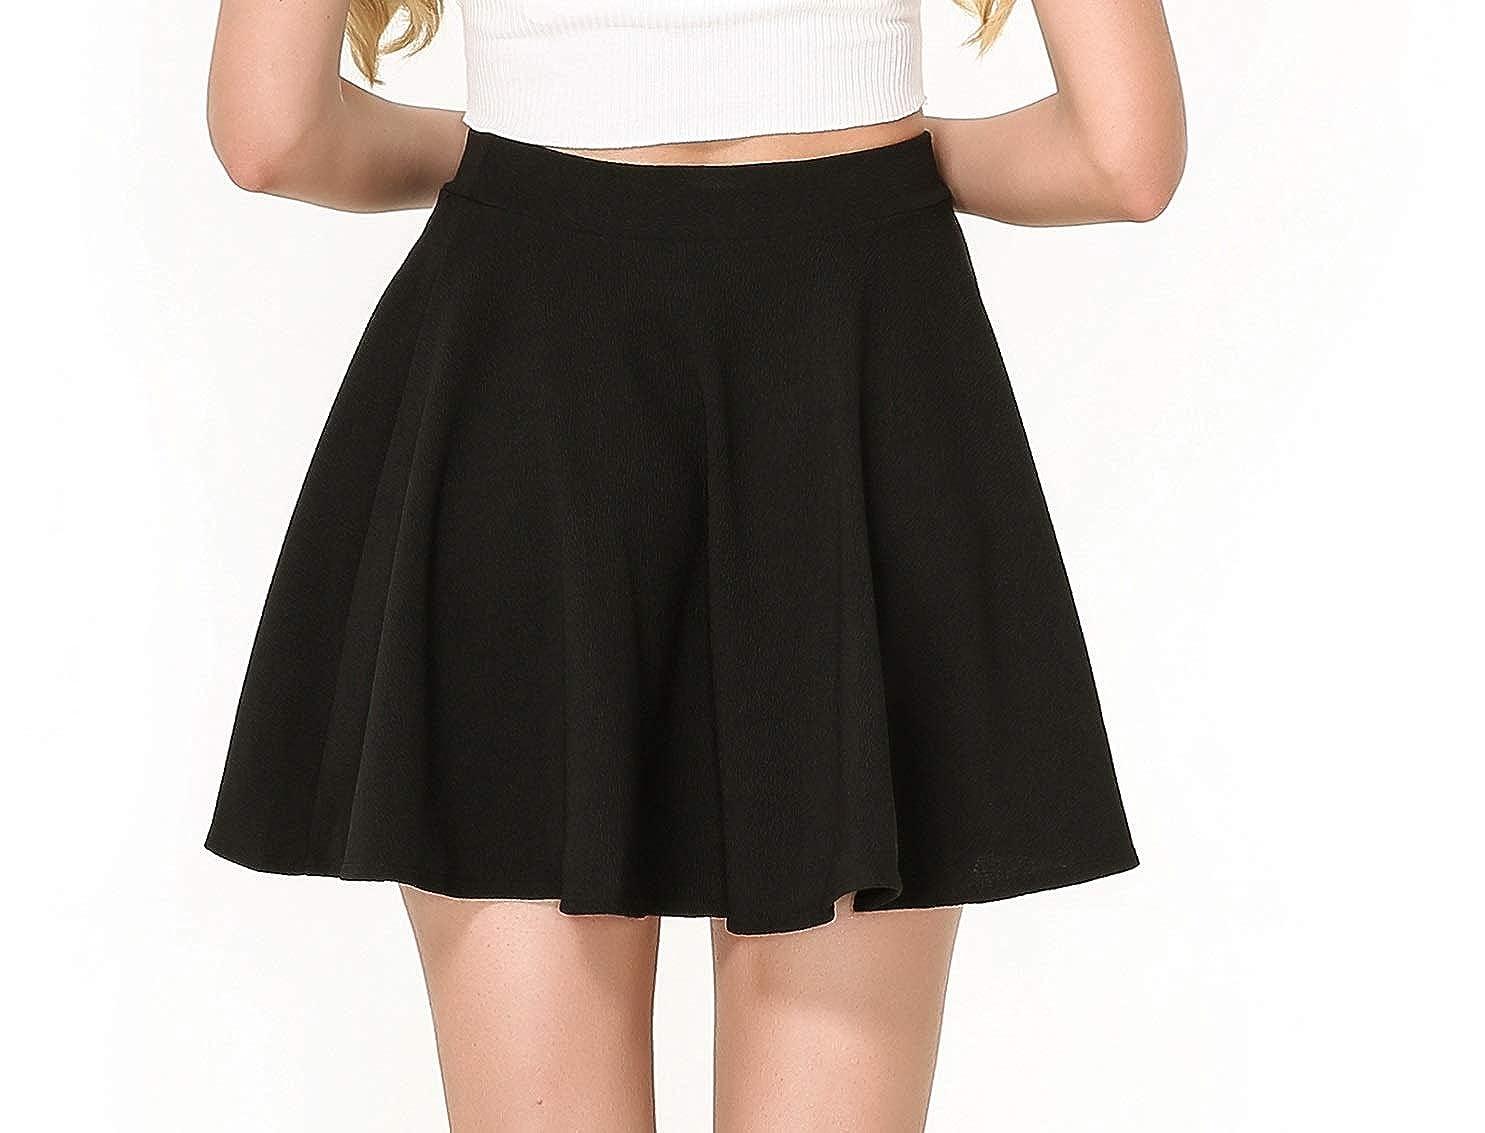 78c9a569f53e0 Amazon.com  Moxeay Women s Stretch High Waist A Line Pleated Flared Mini  Skater Skirt  Clothing